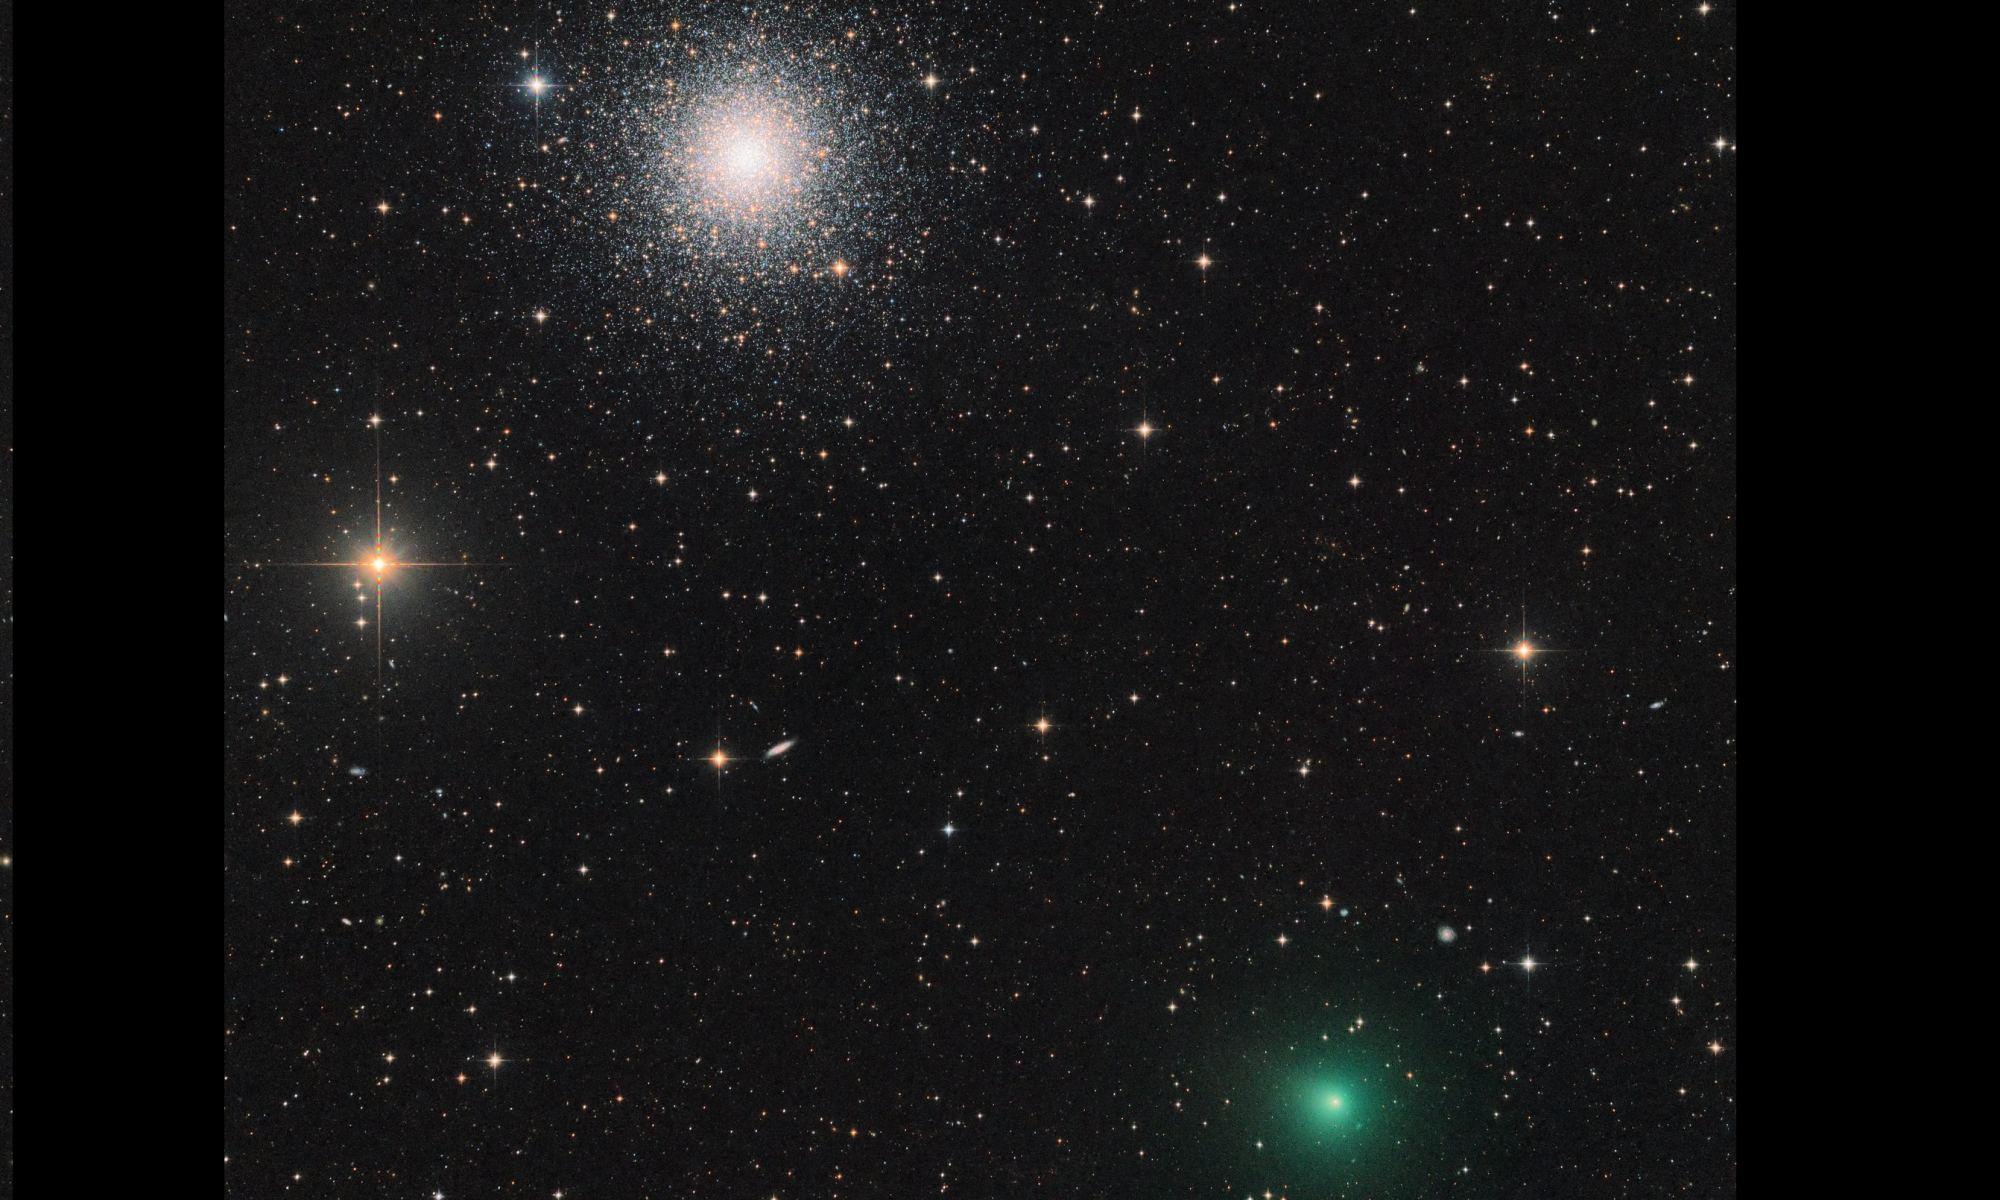 Comet T2 Palomar